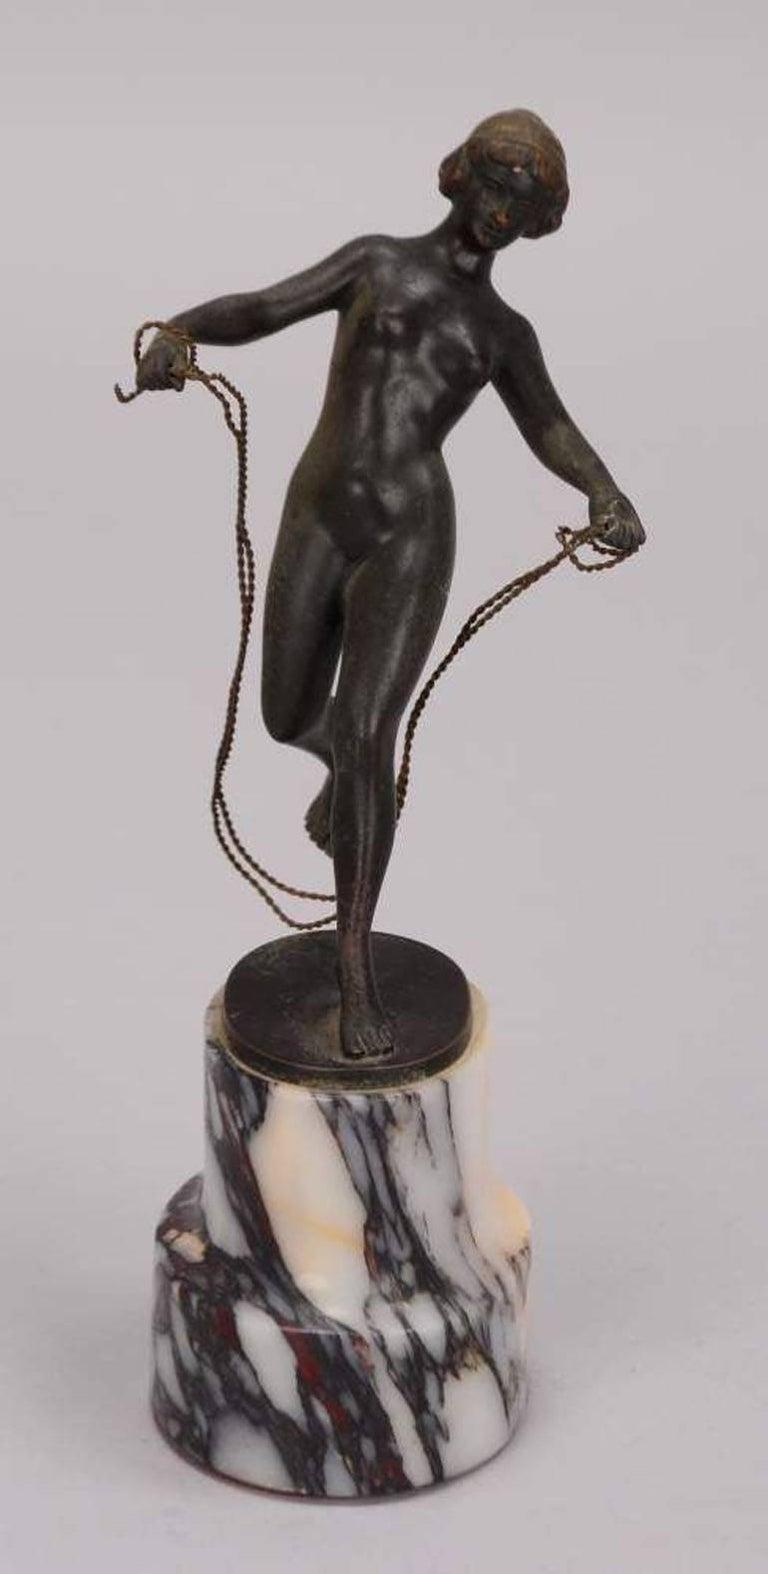 Georges Morin Nude Sculpture - Seilspringerin (Jump Roping Woman) - Bronze, Sculpture, Jugendstil, German, 20th